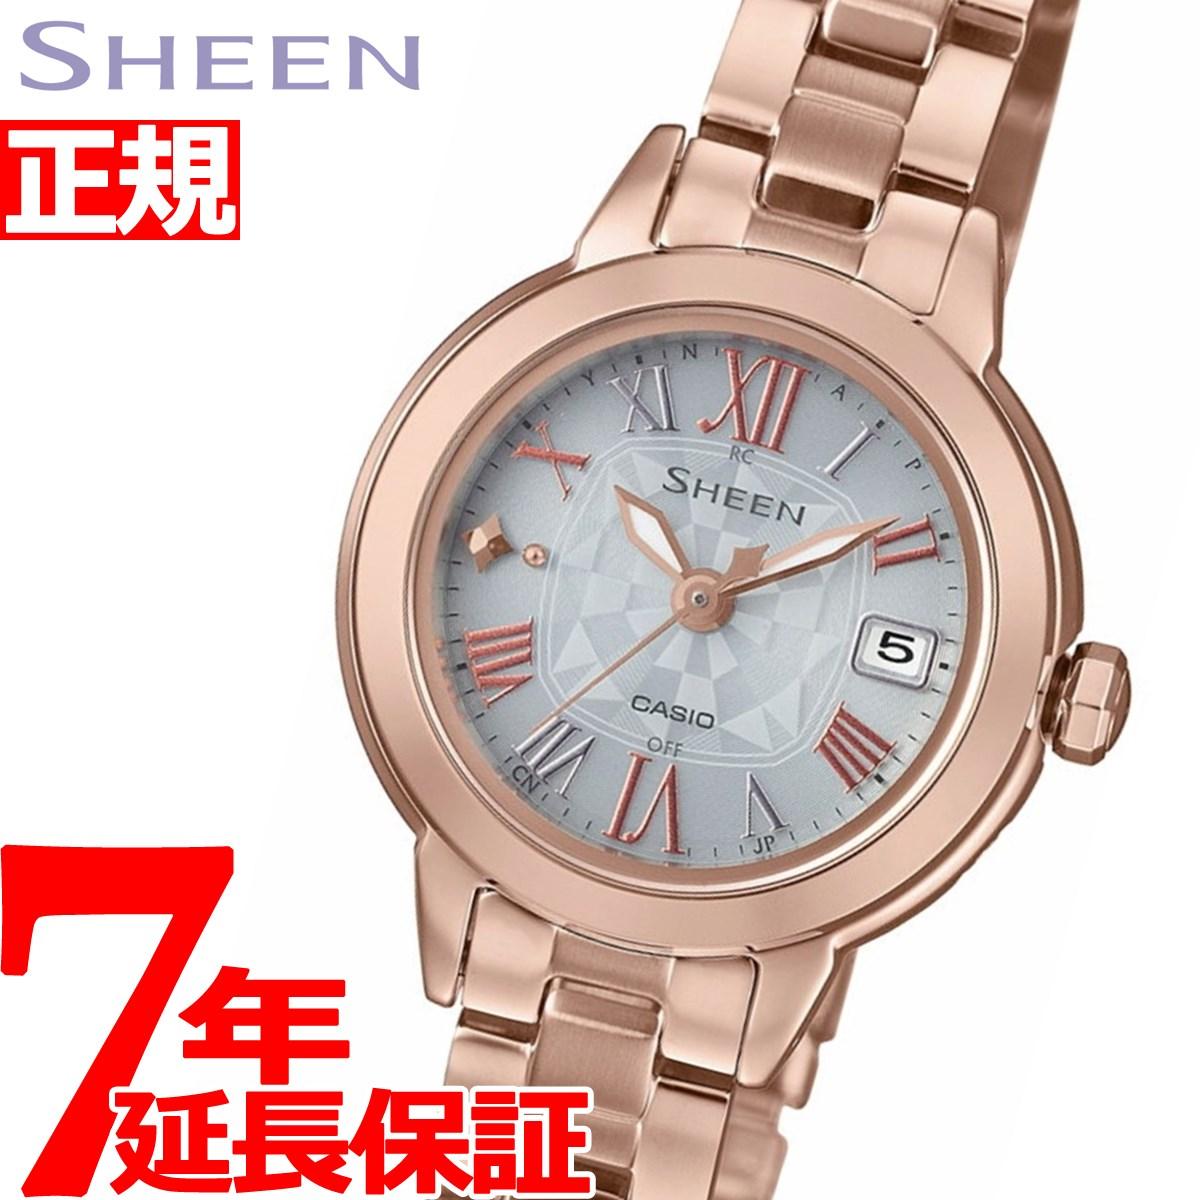 a1caa709fd カシオシーンCASIOSHEEN電波ソーラー電波時計腕時計レディースSHW-5000CG-7AJF【2018